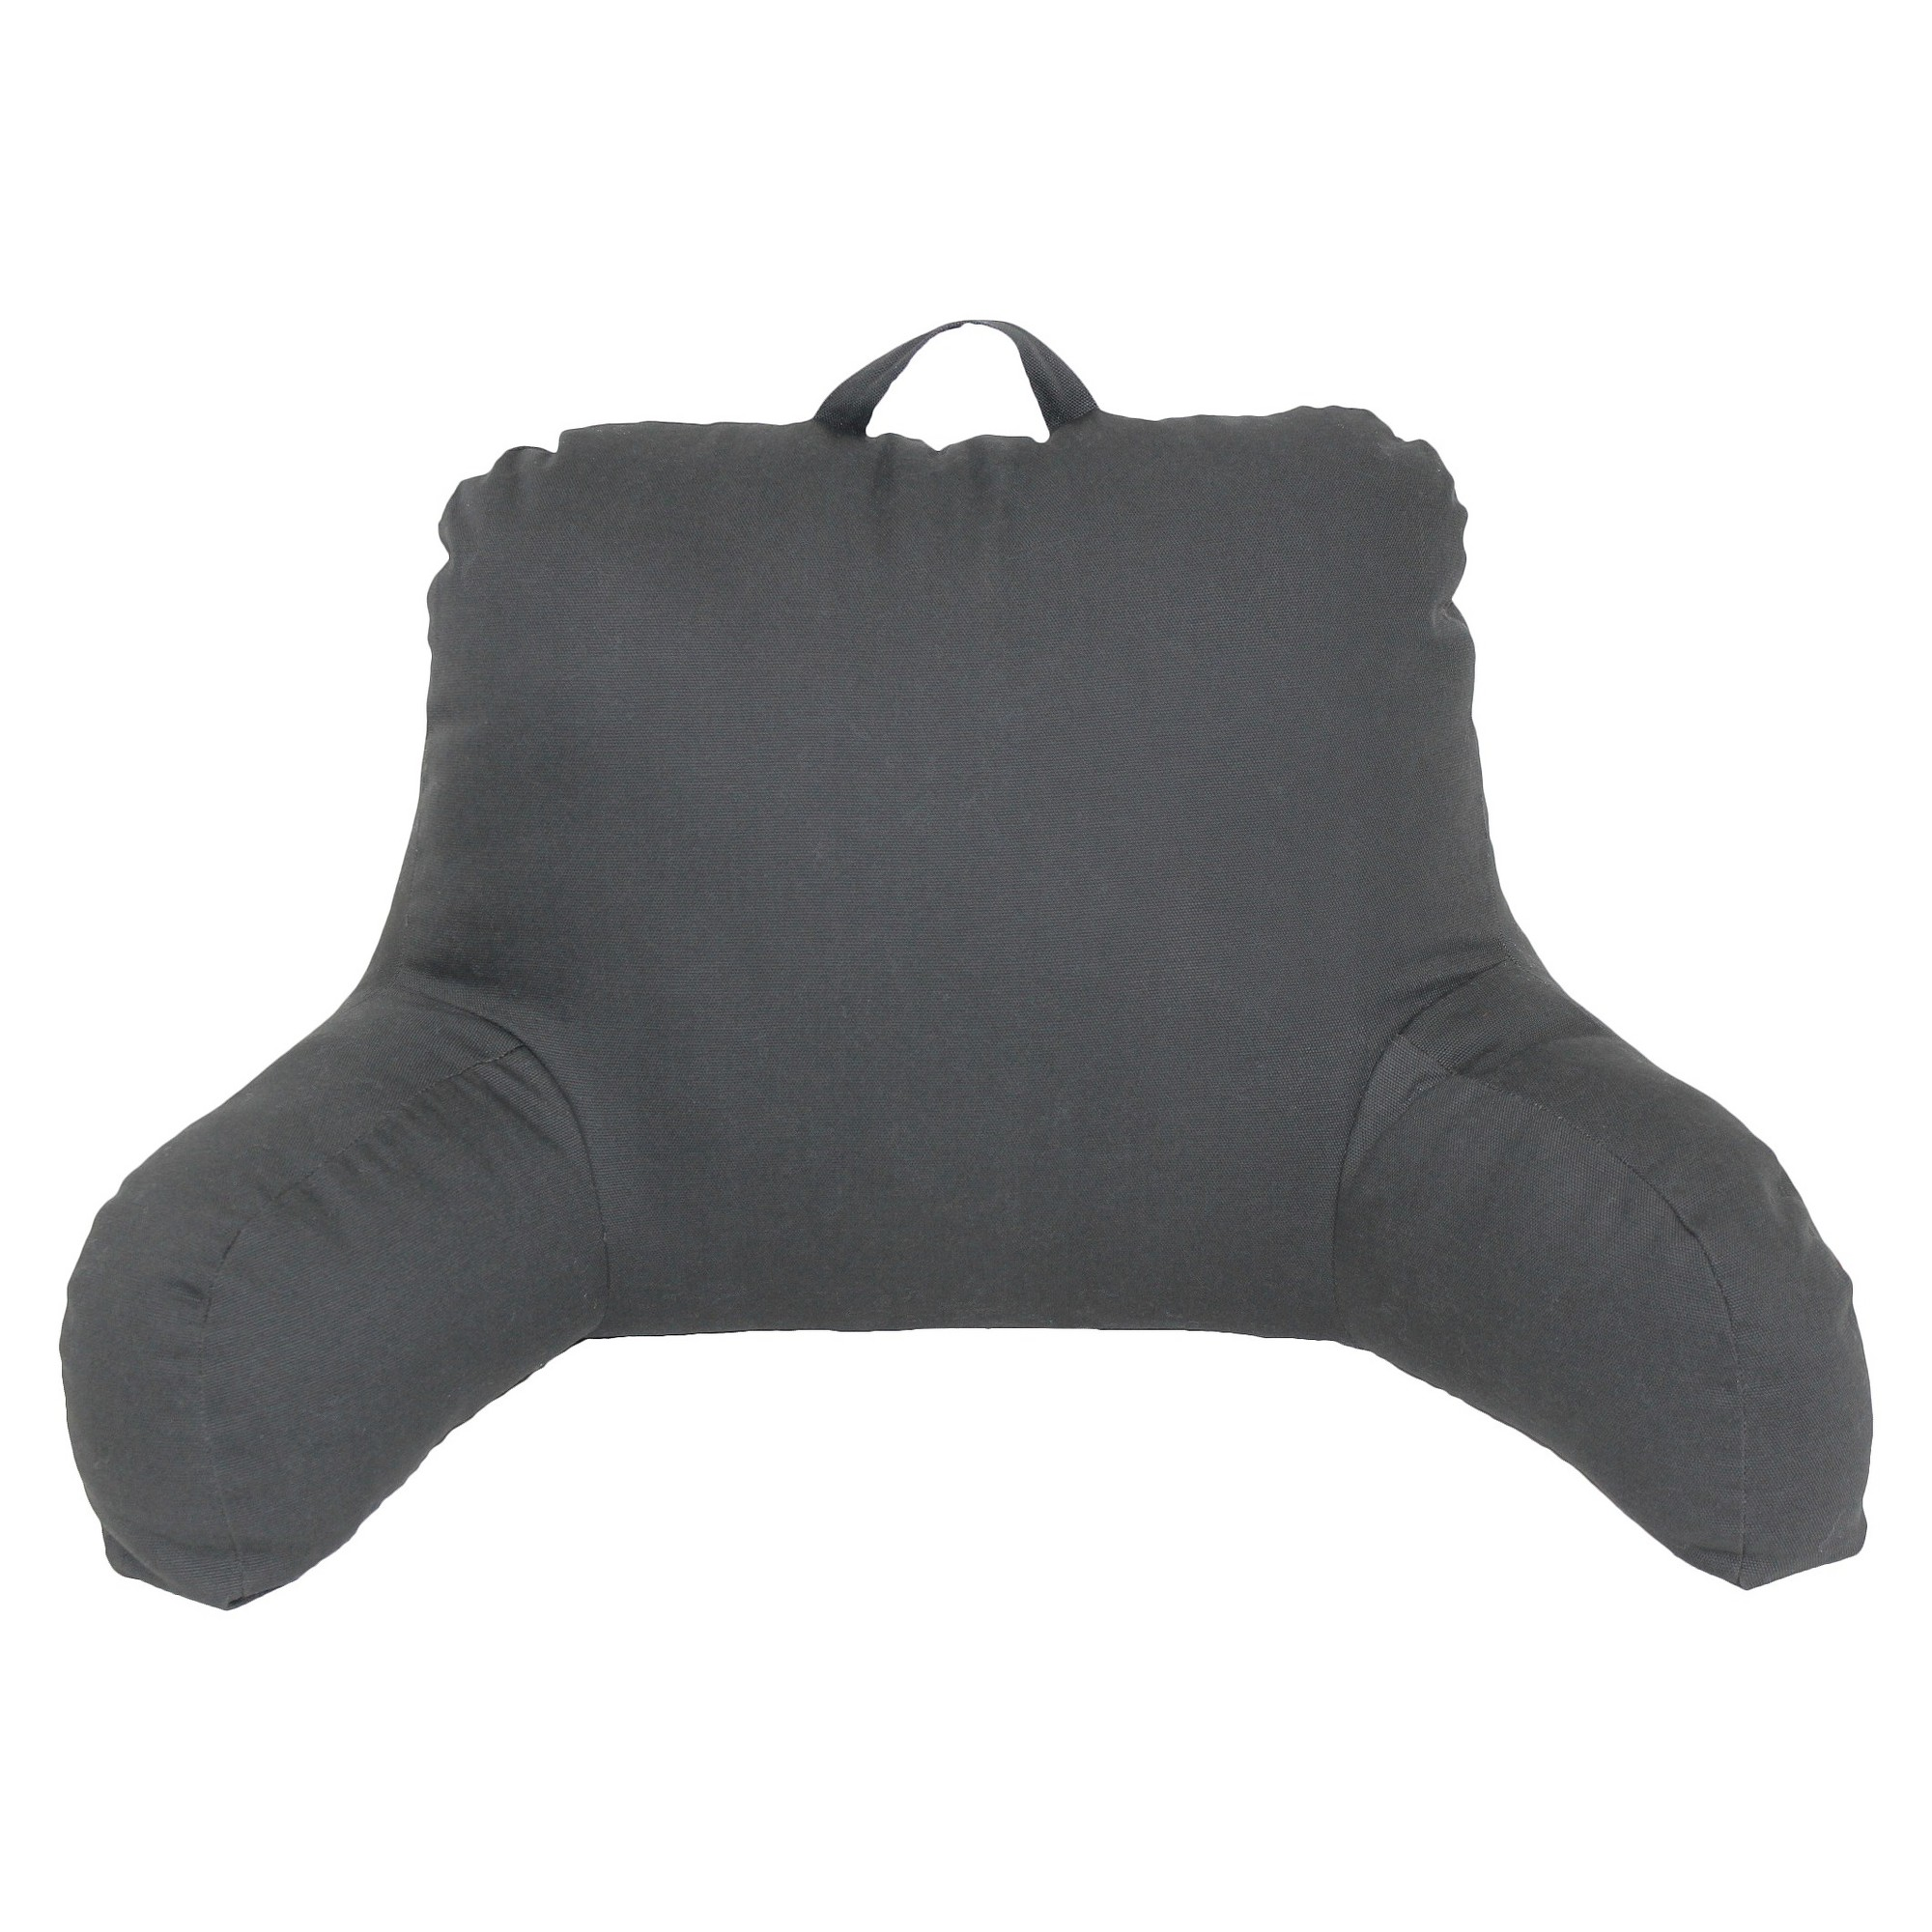 Bedrest Support Pillow Gray Room Essentials Pillow Room Room